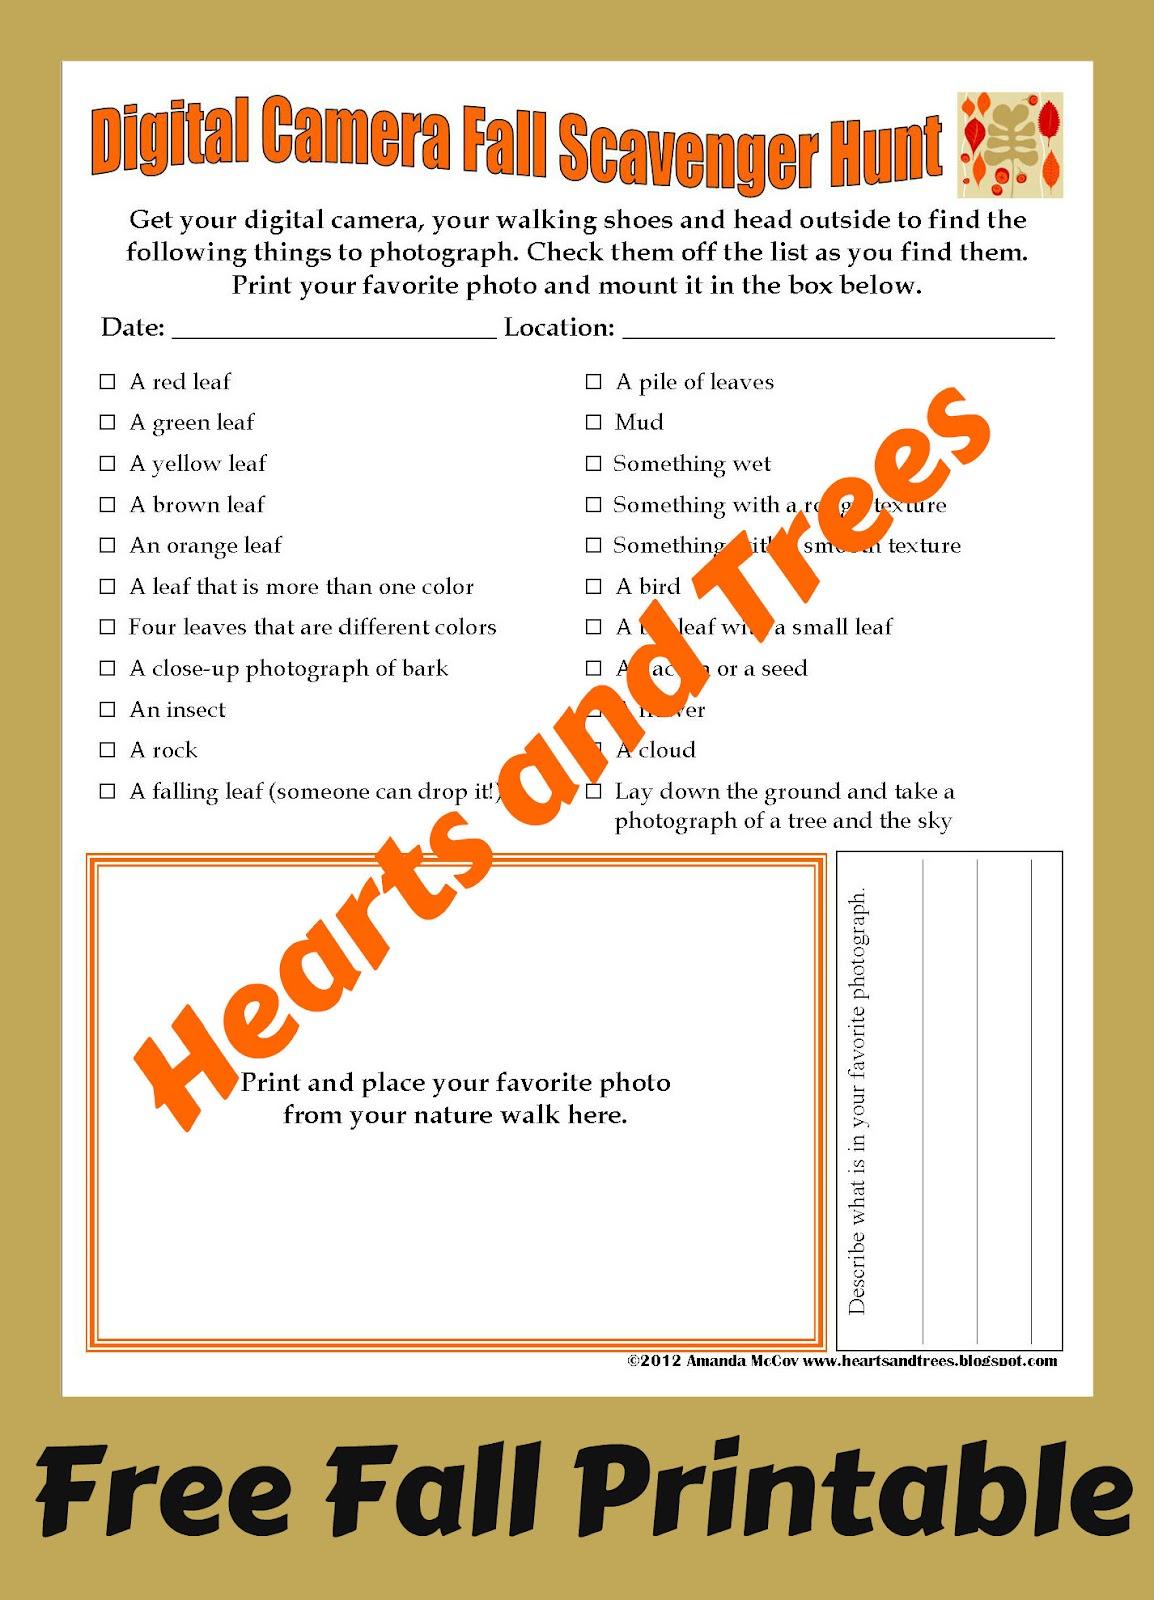 Hearts And Trees Digital Camera Scavenger Hunt Free Printable